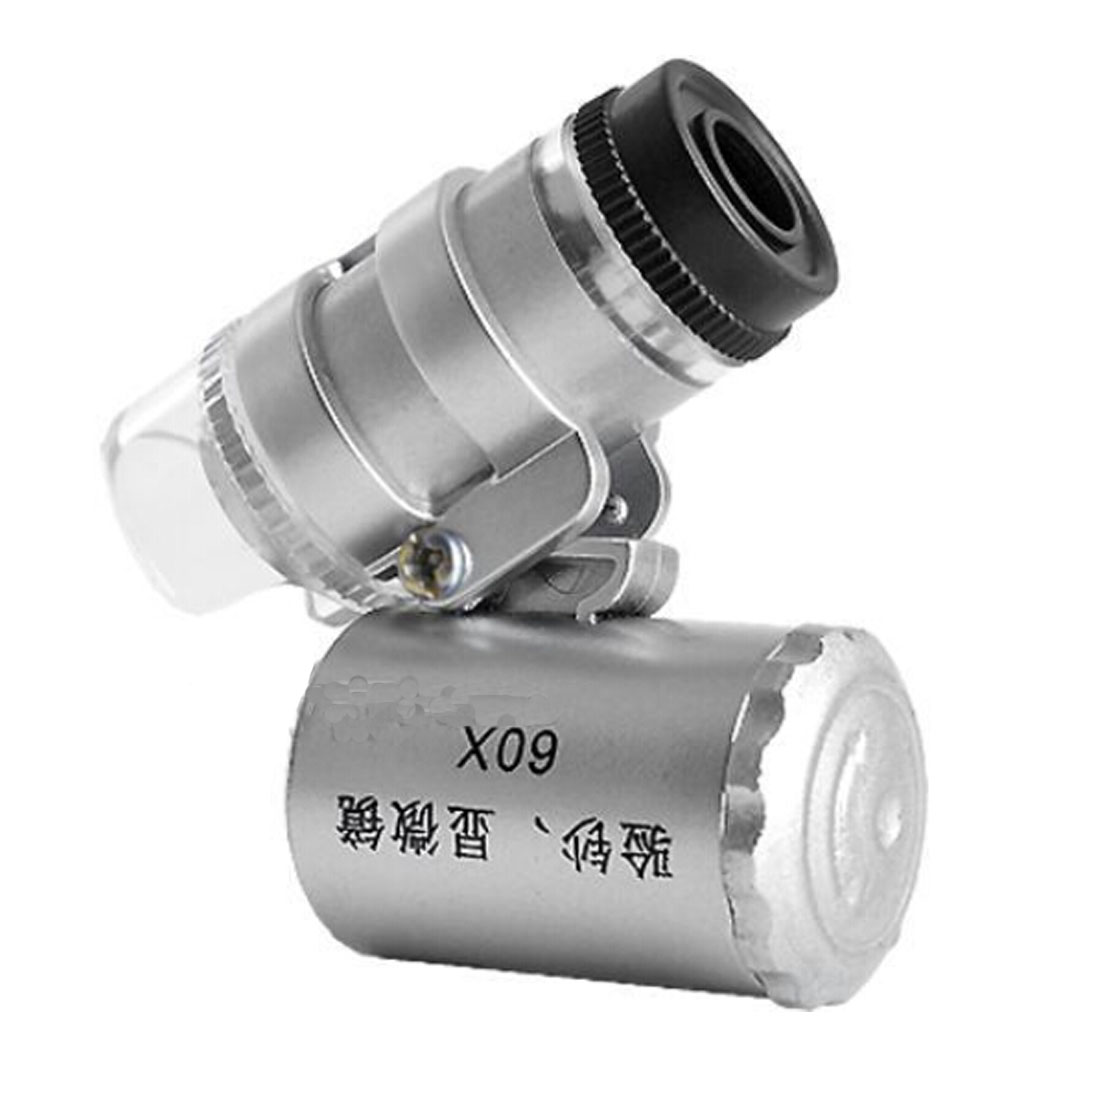 60X Mini Microscope Jeweler Loupe Lens Illuminated Magnifier Glass 3 LED With UV Light 60X Mini Microscope Jeweler Loupe Lens Illuminated Magnifier Glass 3 LED With UV Light